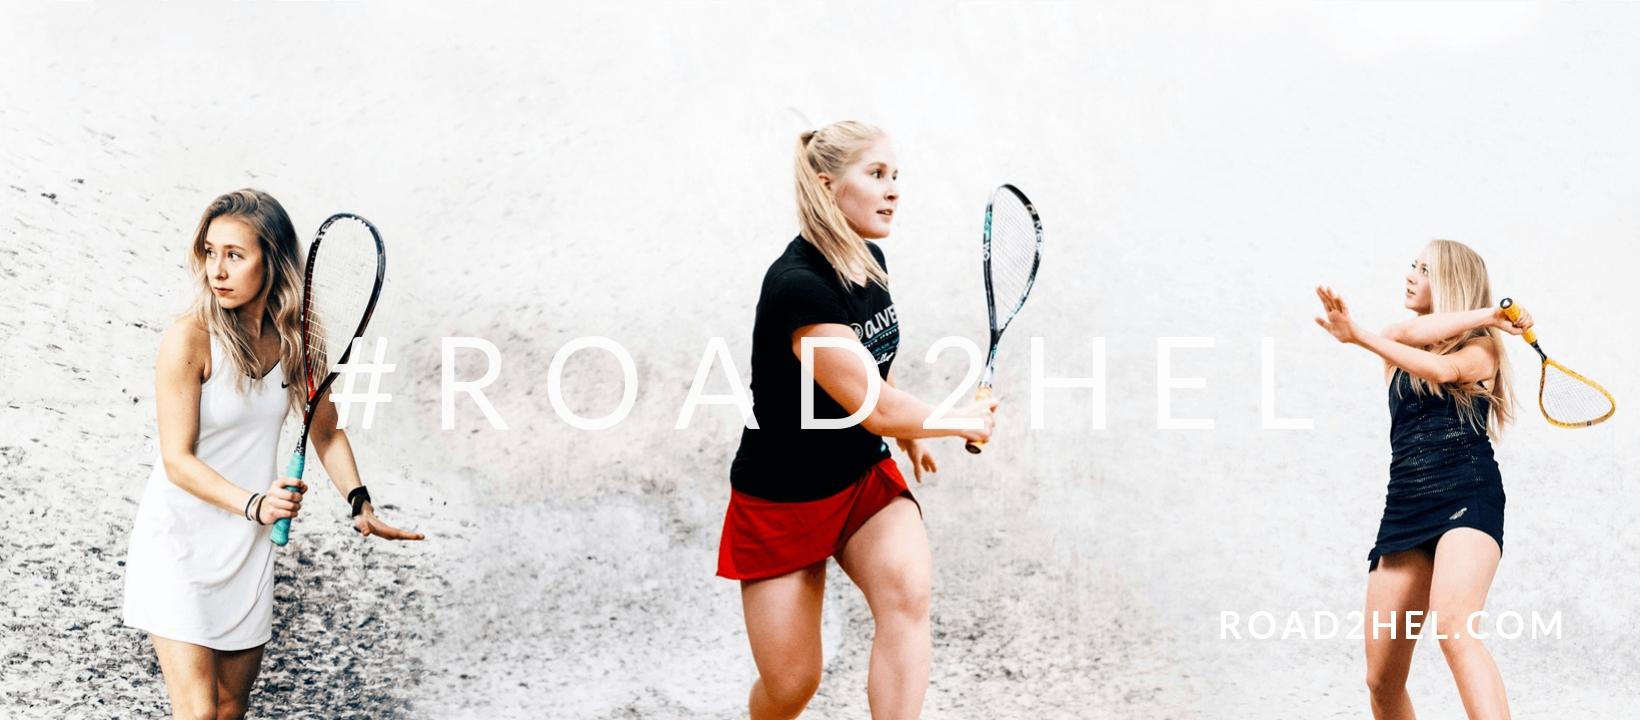 Road2Hel - 2021 Squash Championships